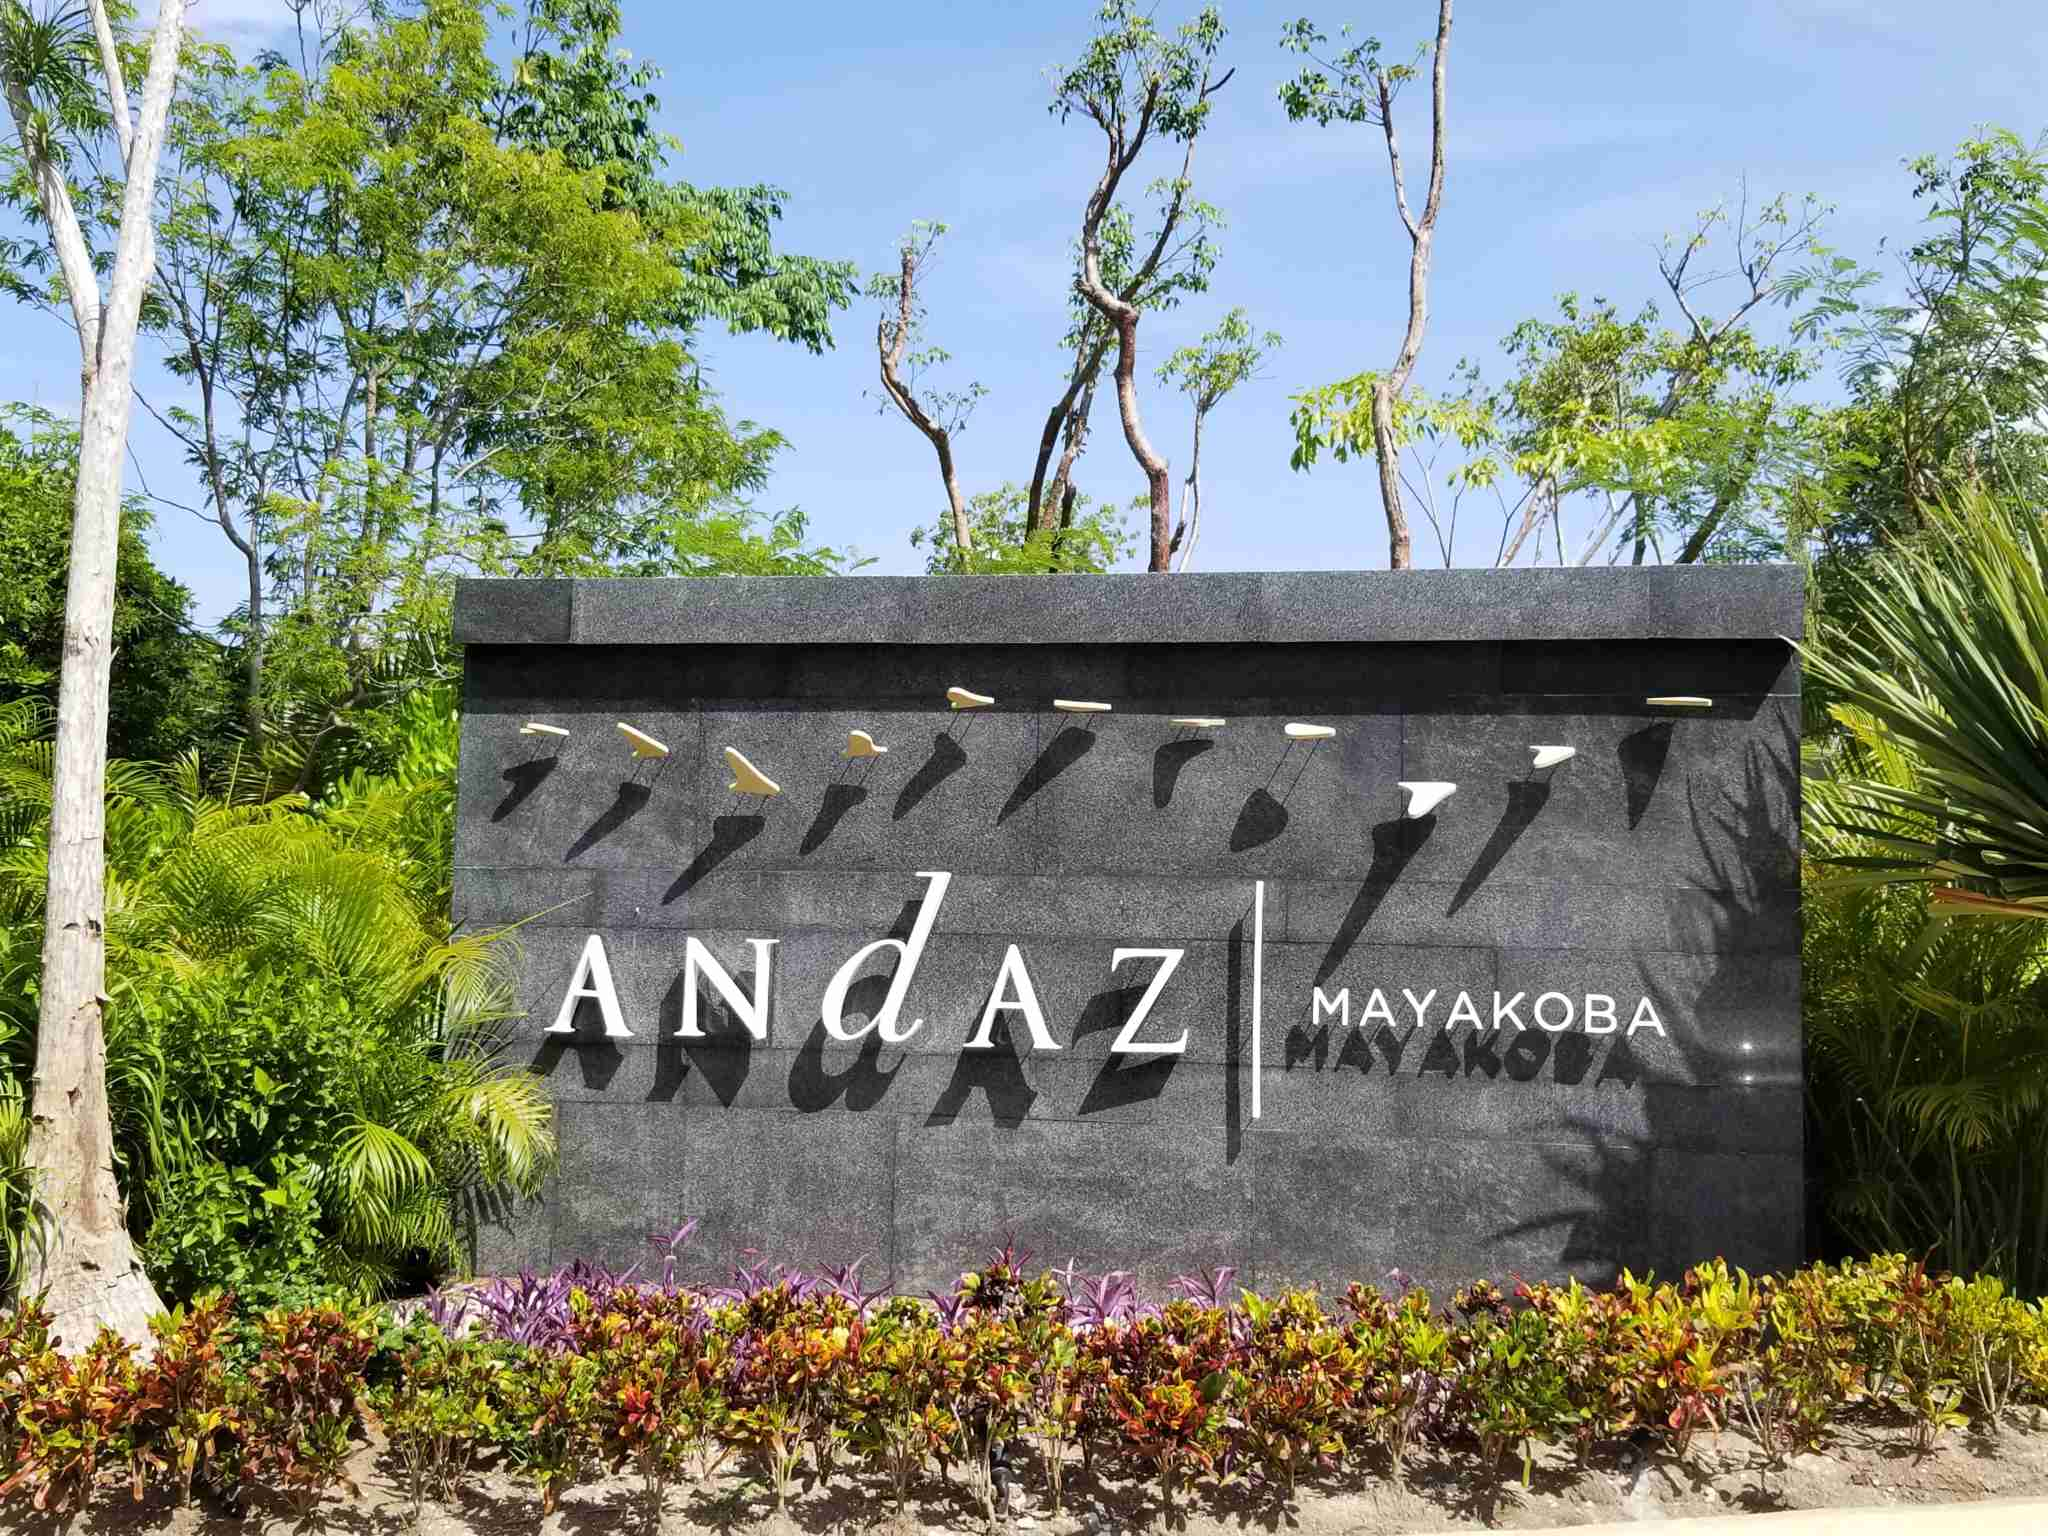 Andaz Mayakoba Entrance